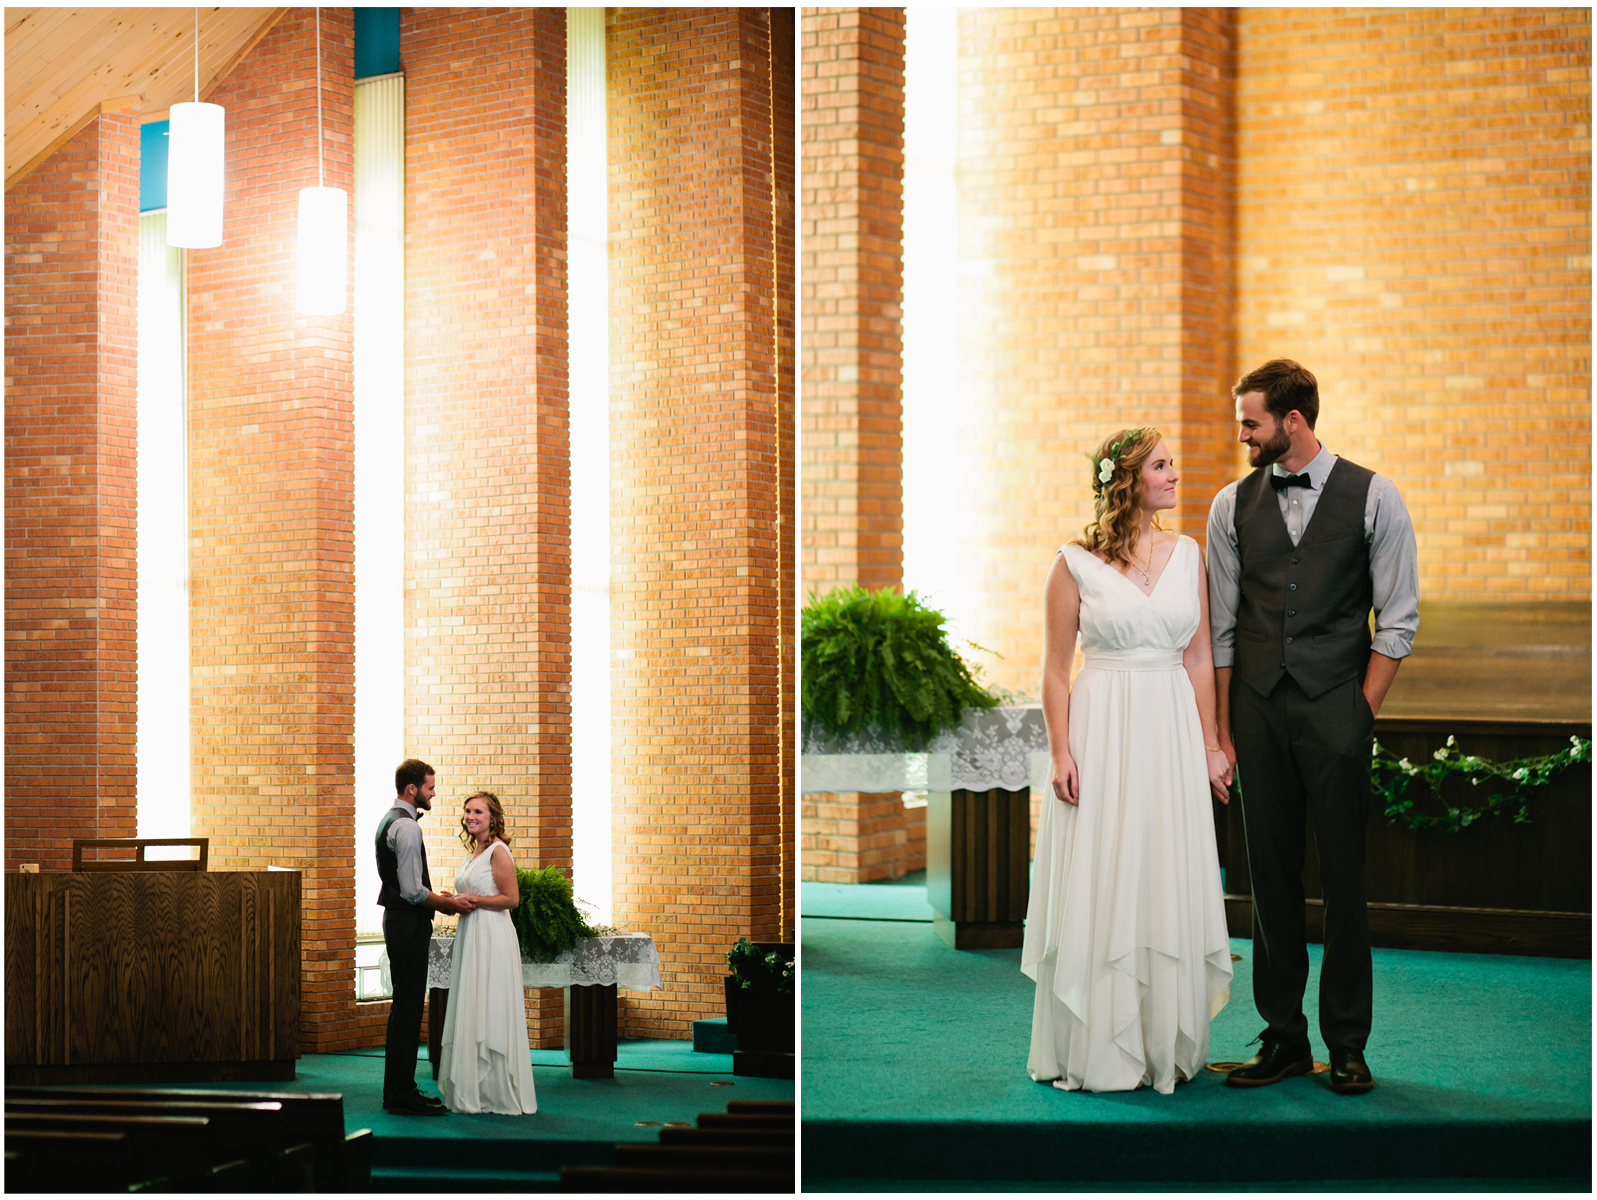 ames_wedding_photos02.jpg